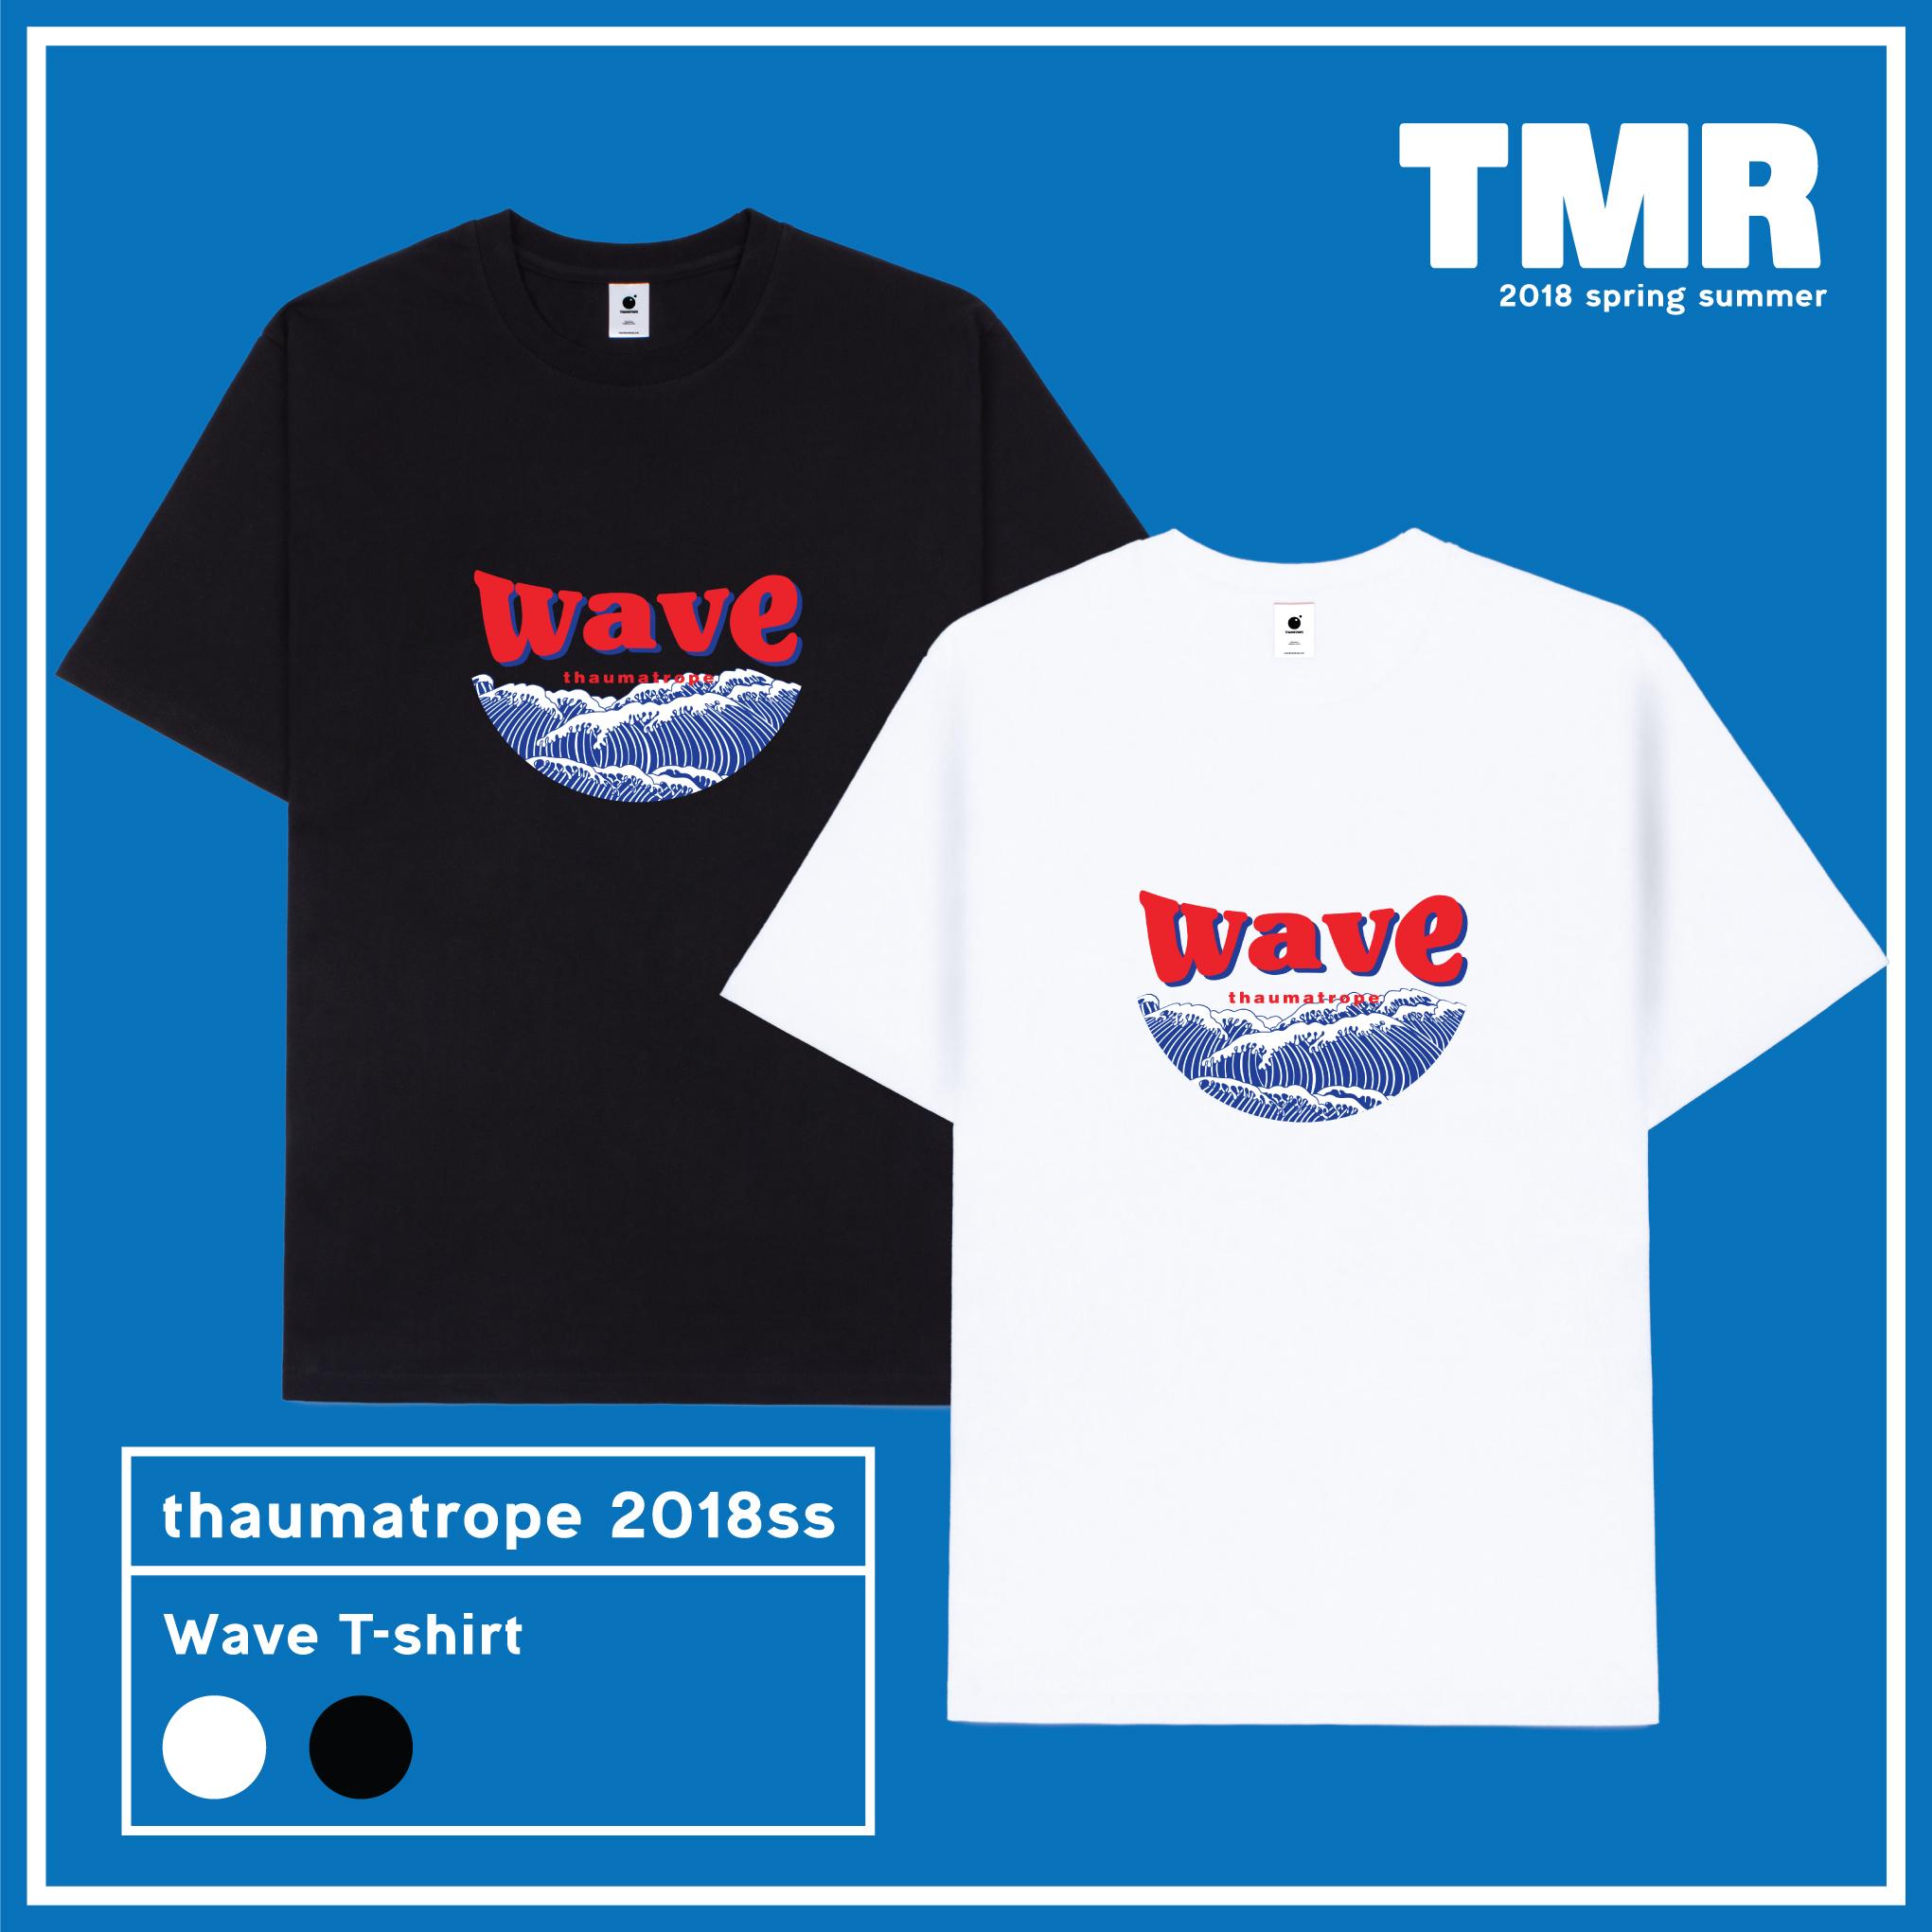 TMR WAVE T-SHIRTS